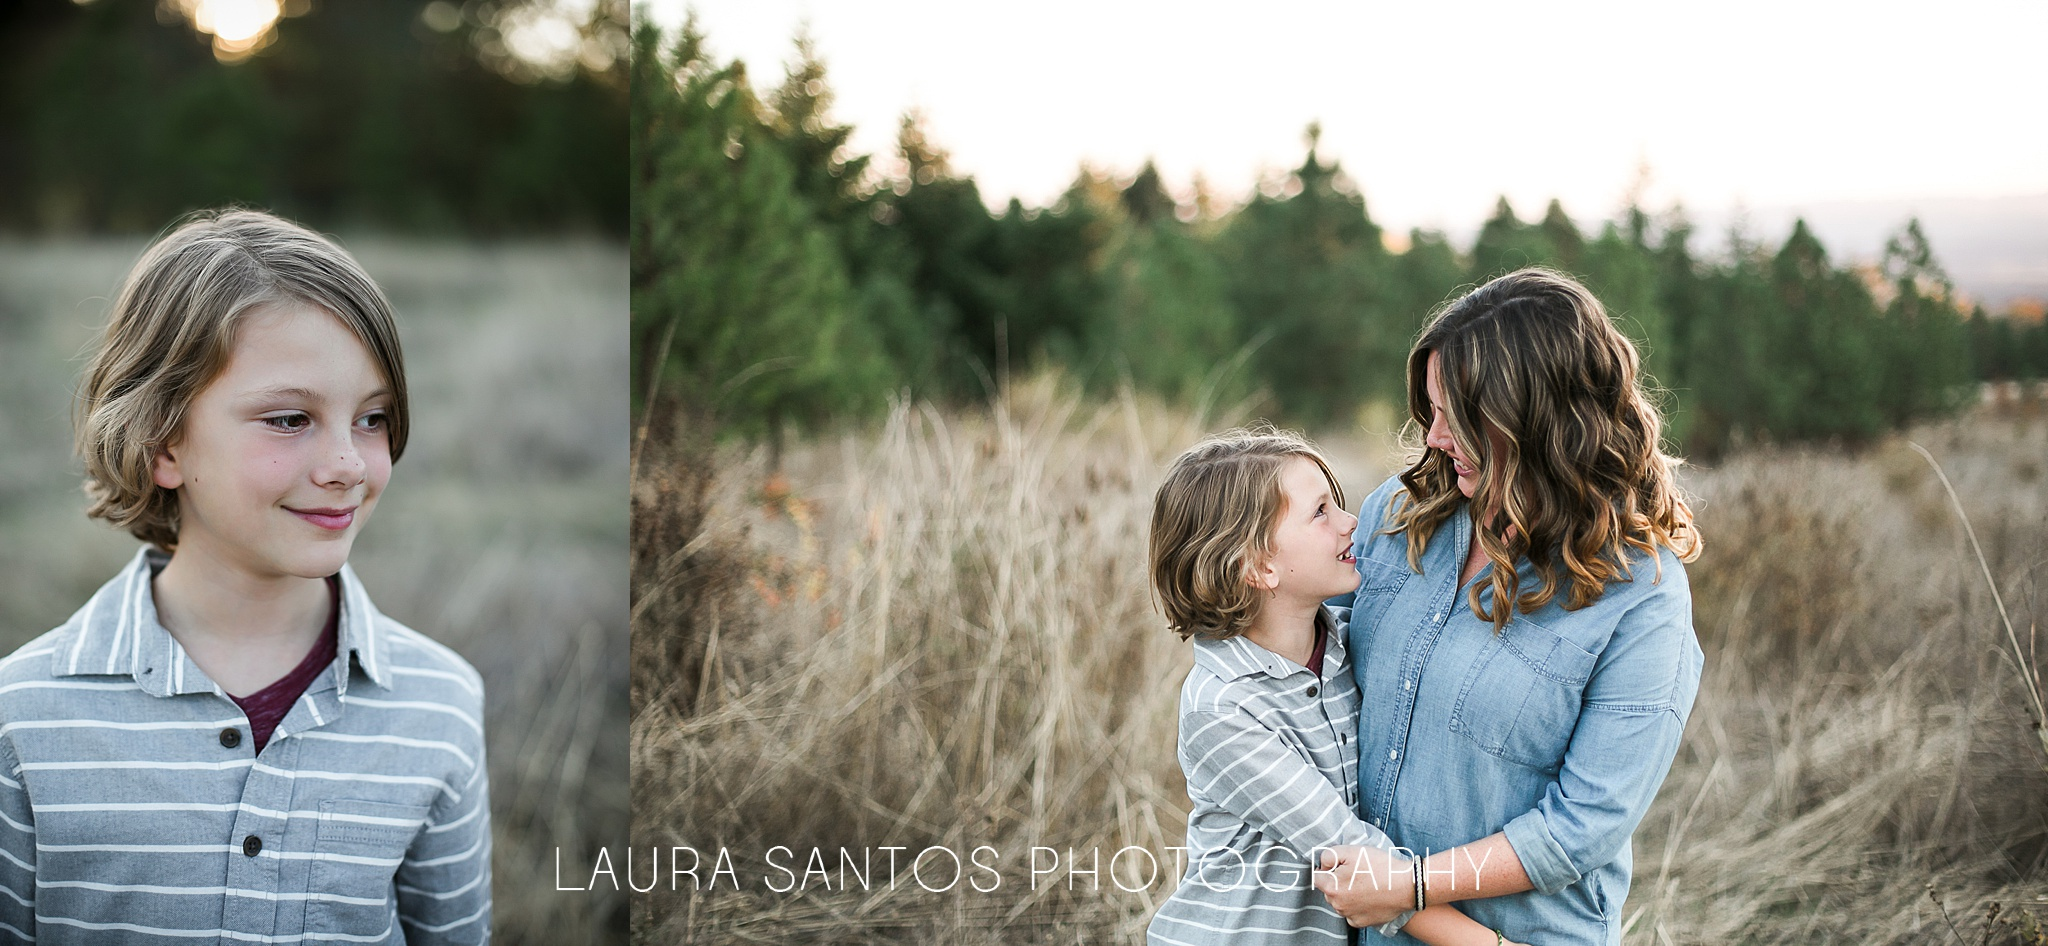 Laura Santos Photography Portland Oregon Family Photographer_0905.jpg